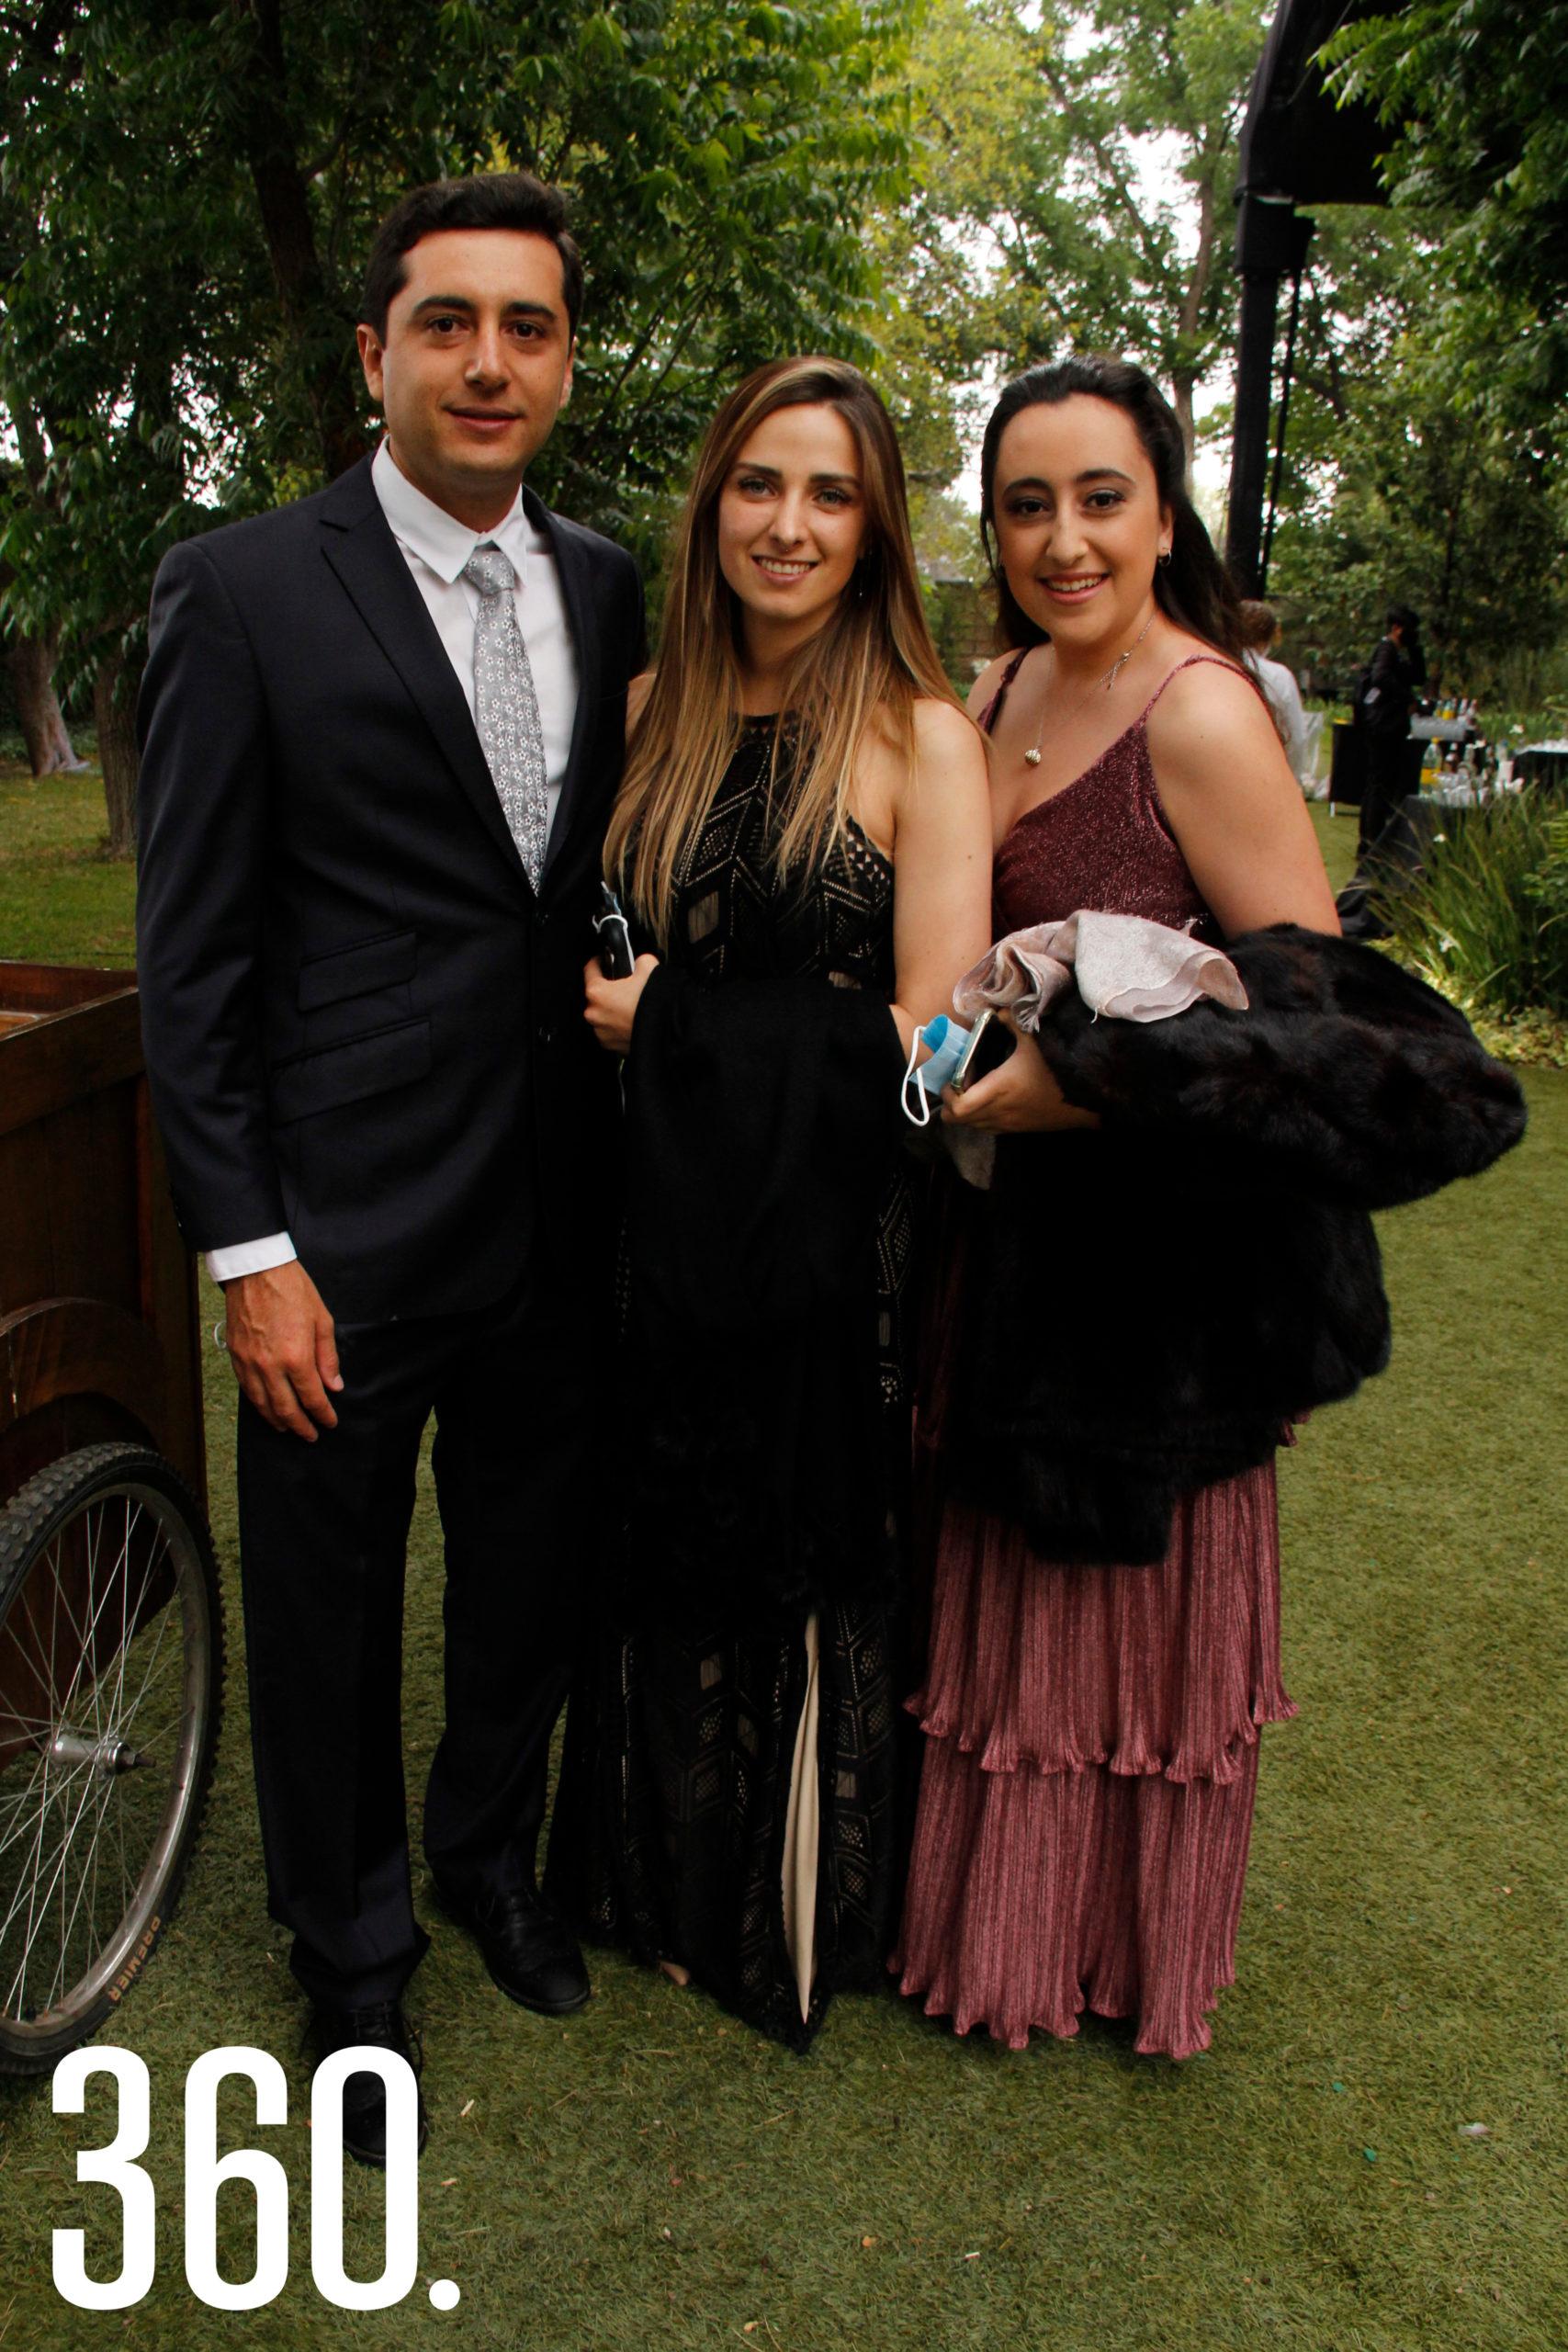 Guillermo Osuna, Diana Garza y María Andrea Osuna.